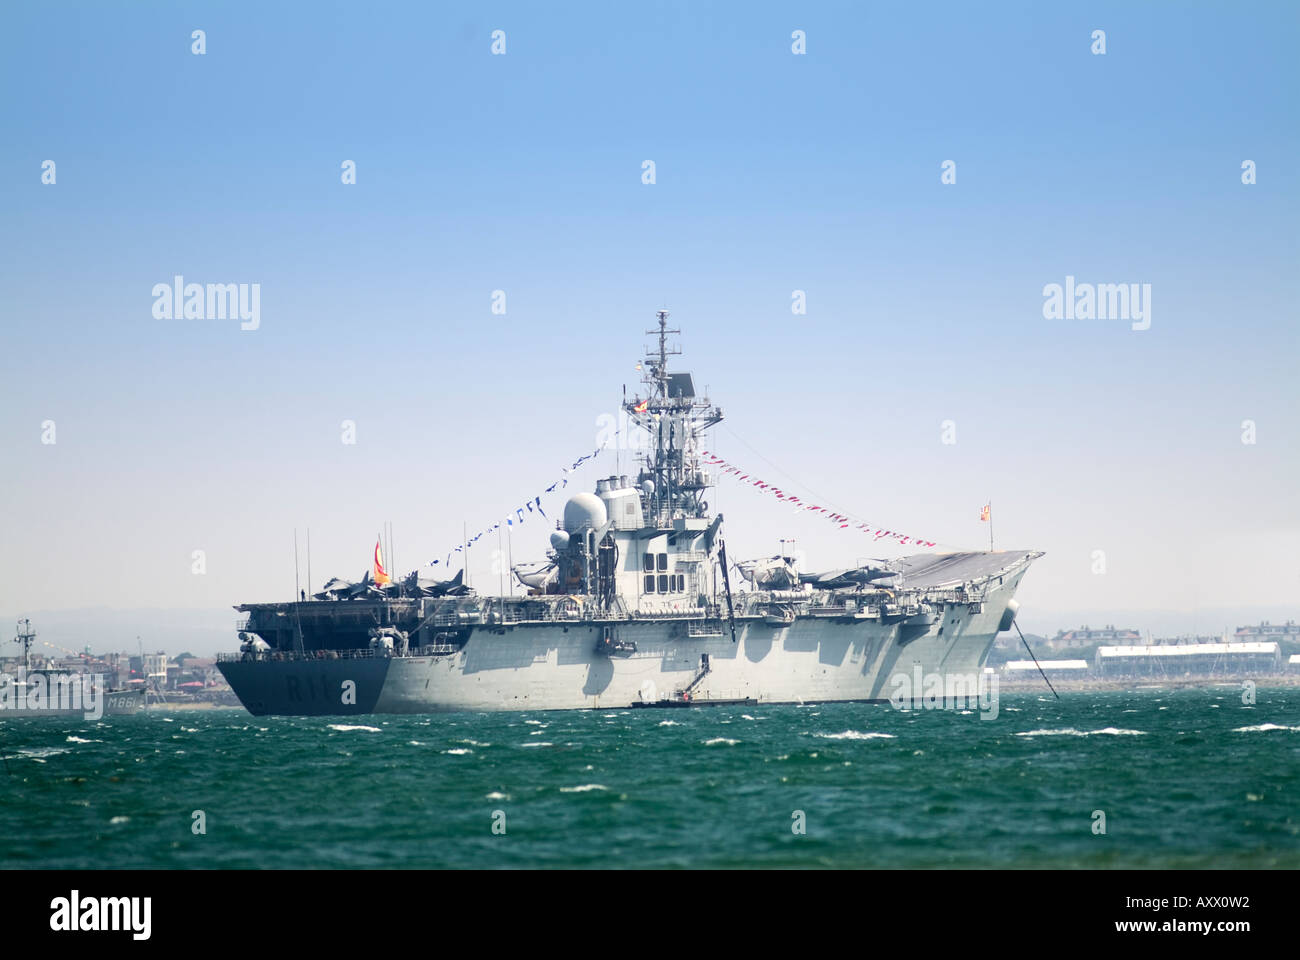 Spanish aircraft carrier SPS Principe De Asturias R11 ...Spanish Aircraft Carrier Principe De Asturias